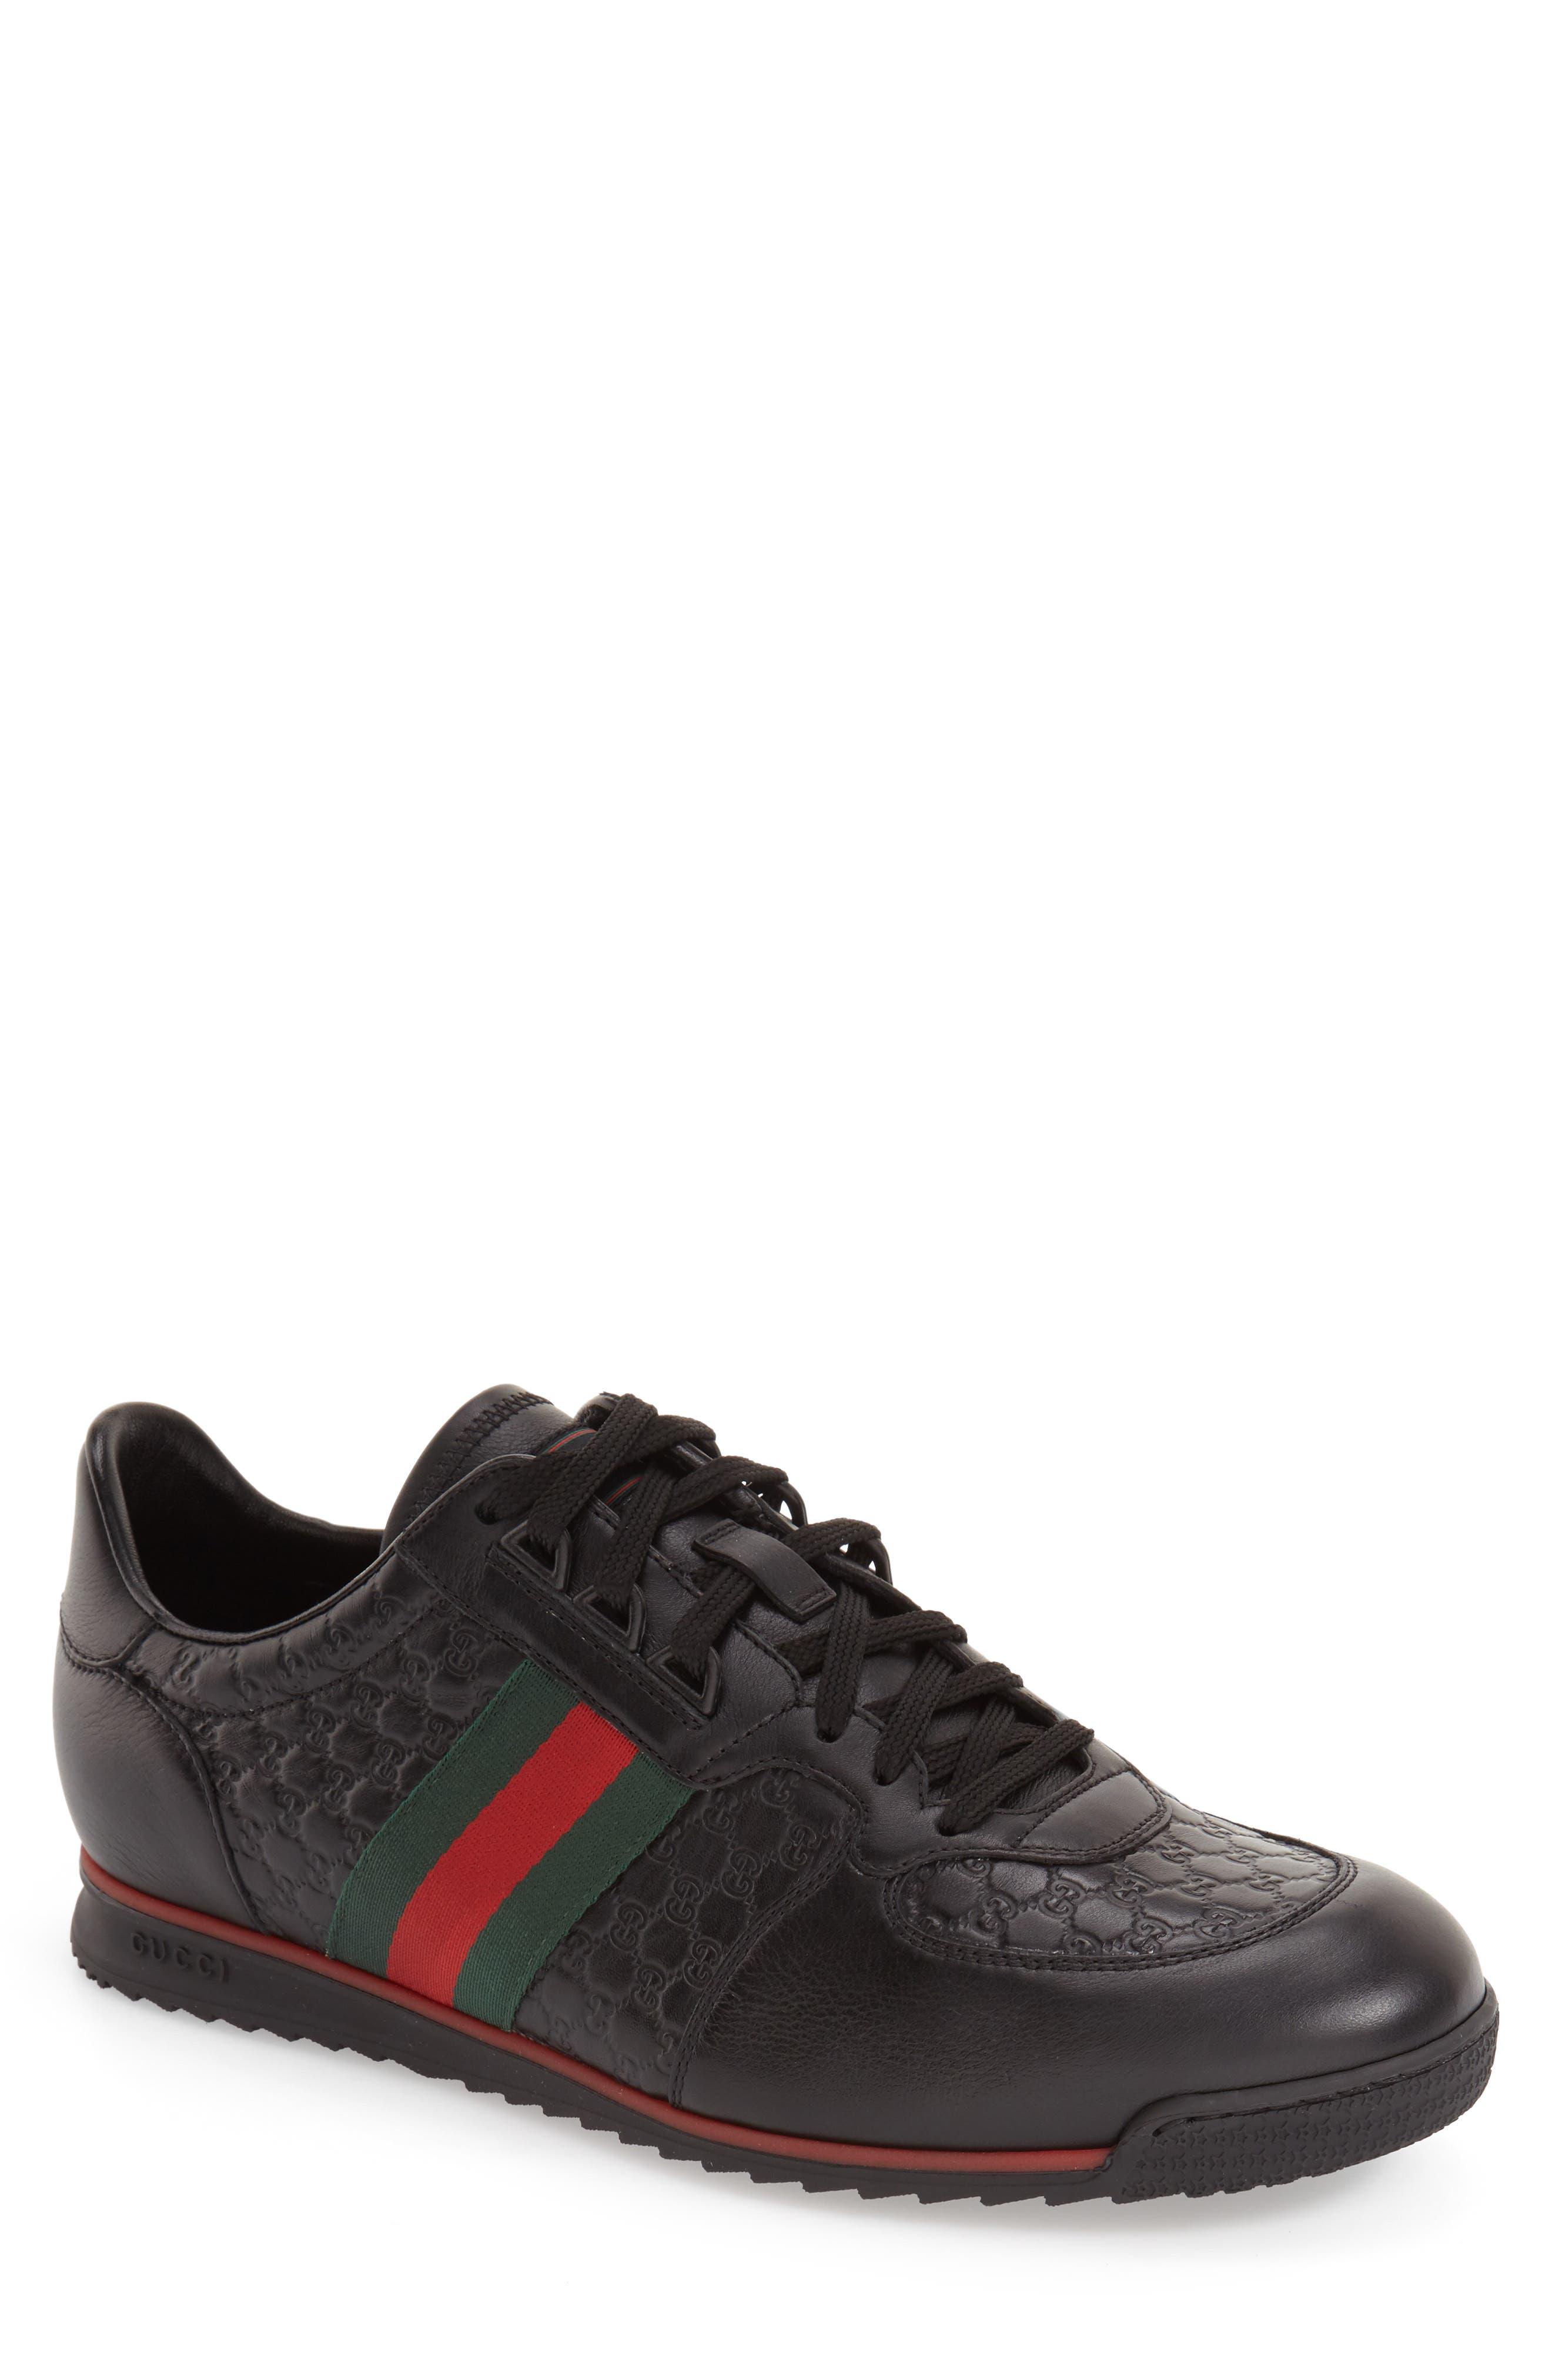 SL 73 Sneaker,                             Alternate thumbnail 2, color,                             BLACK